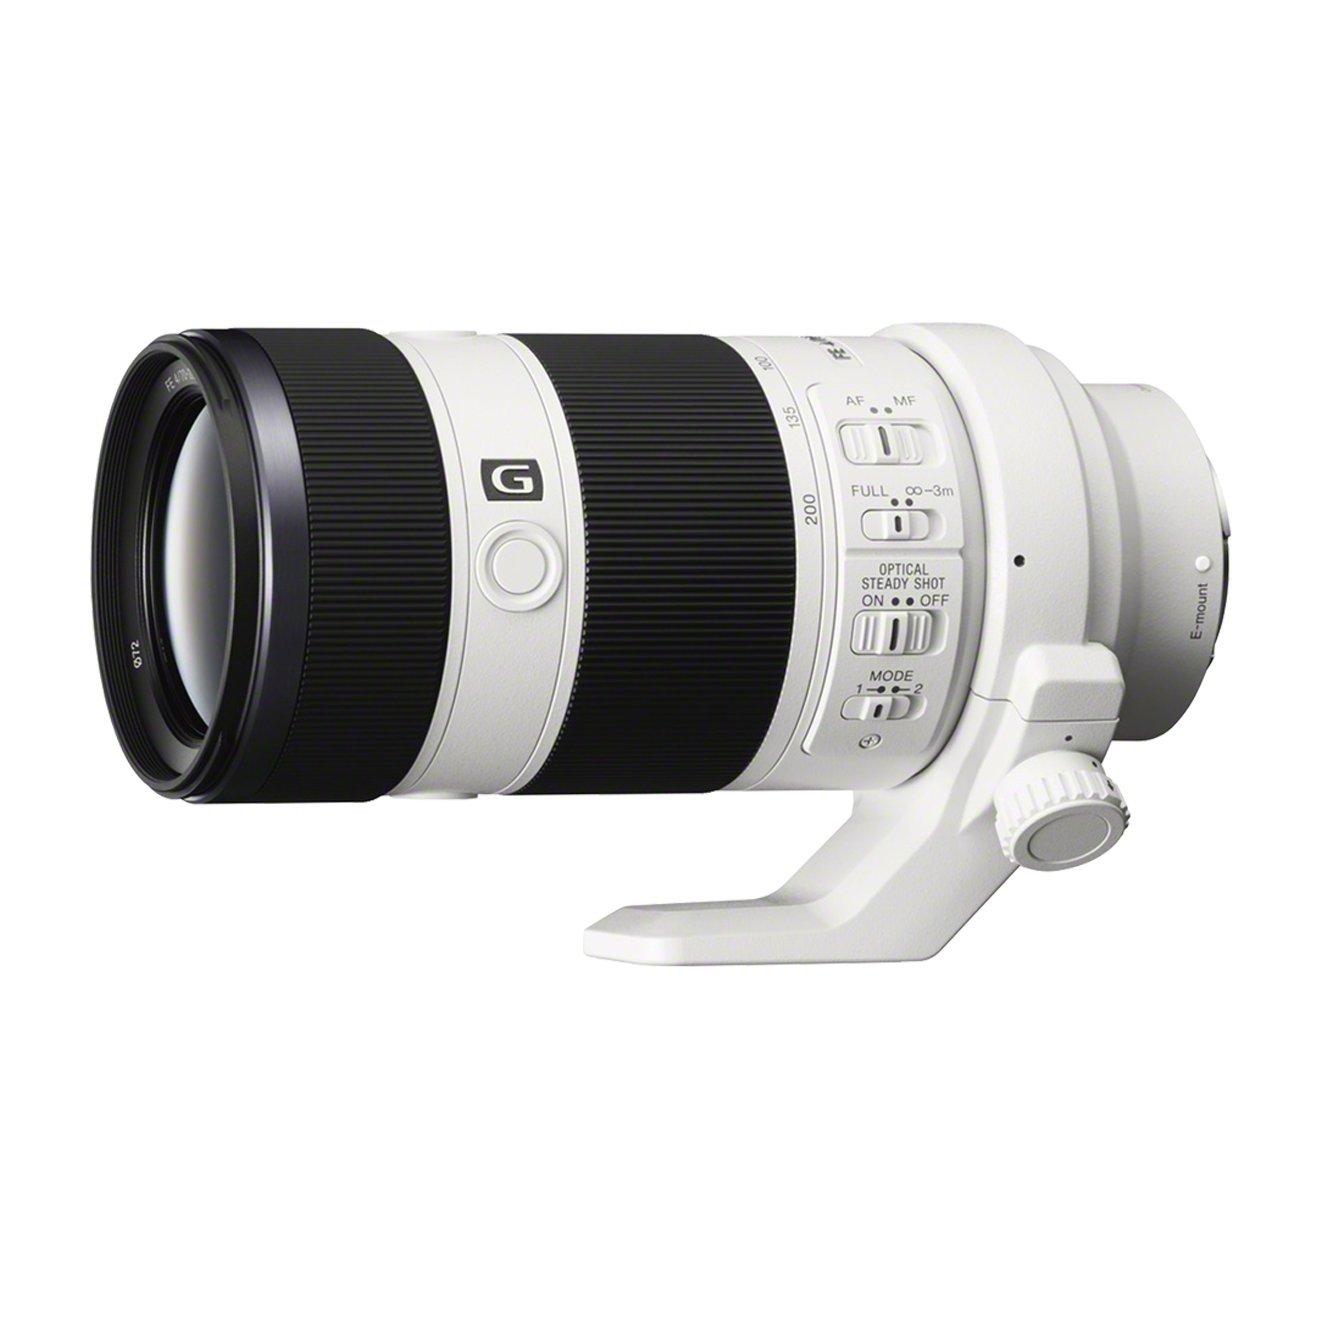 Sony SELG Objetivo OSS montura E para Sony Minolta distancia focal mm